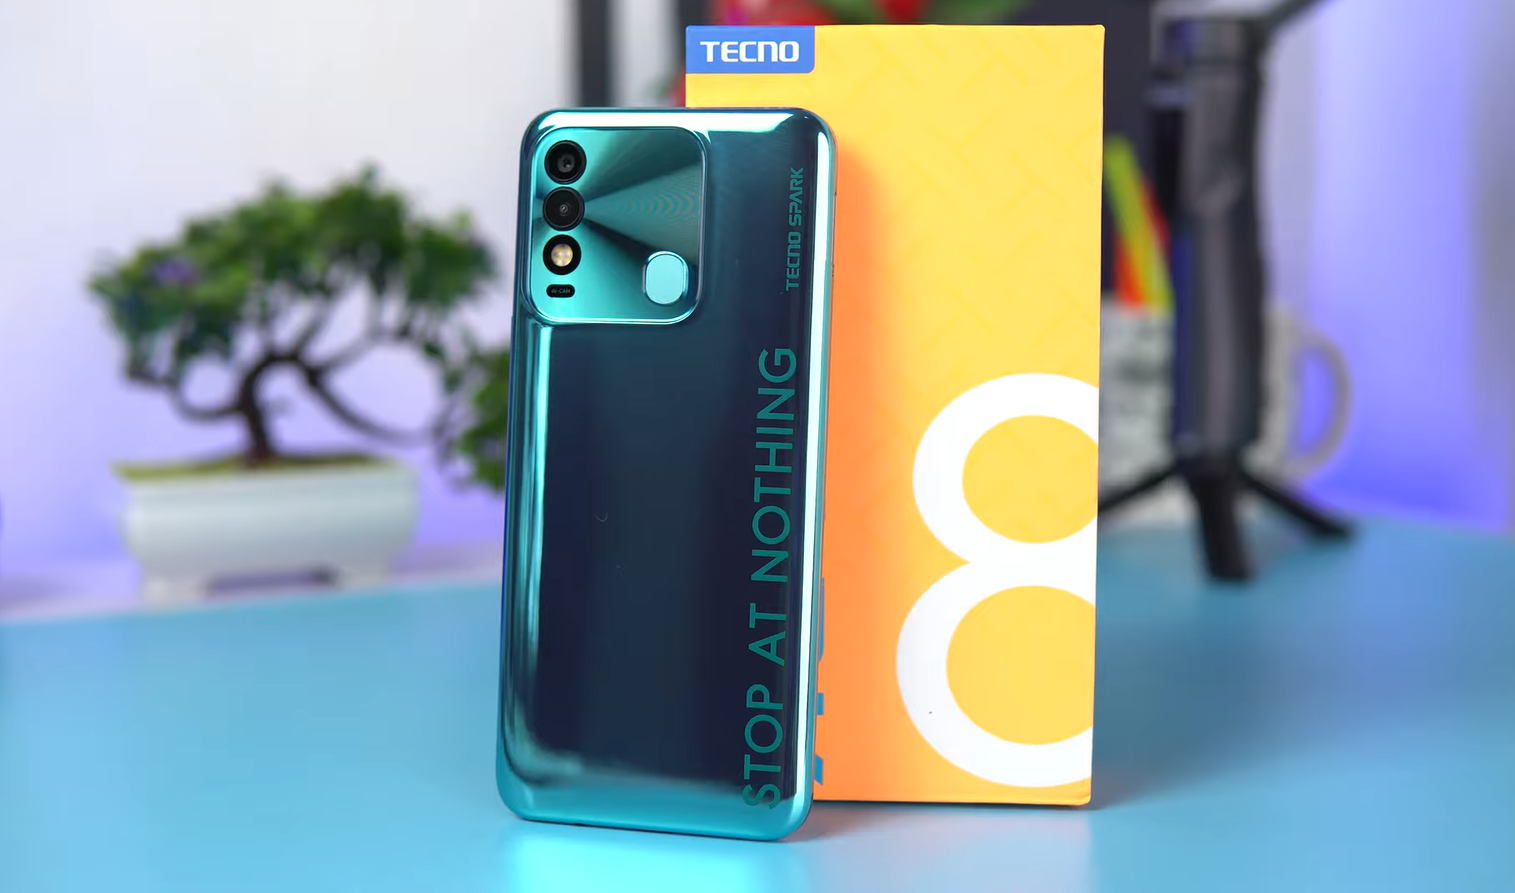 Tecno Spark 8 feature image